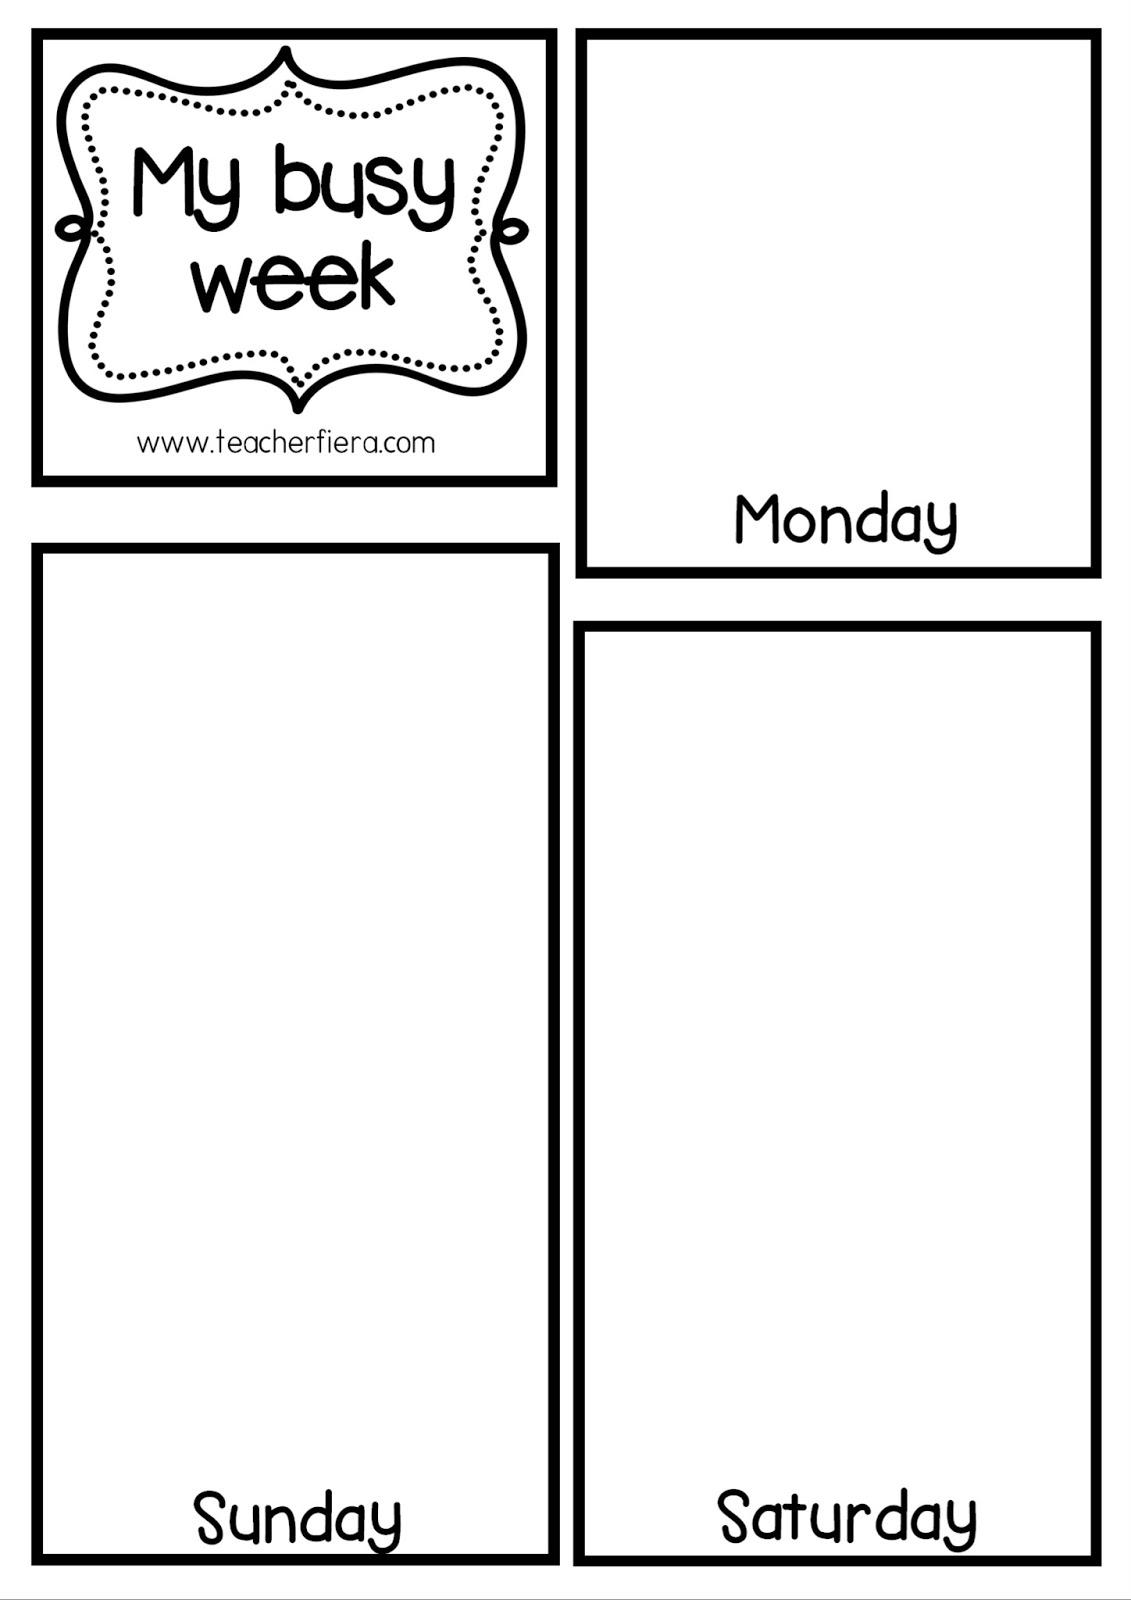 Teacherfiera My Busy Week Flip Book Template Year 2